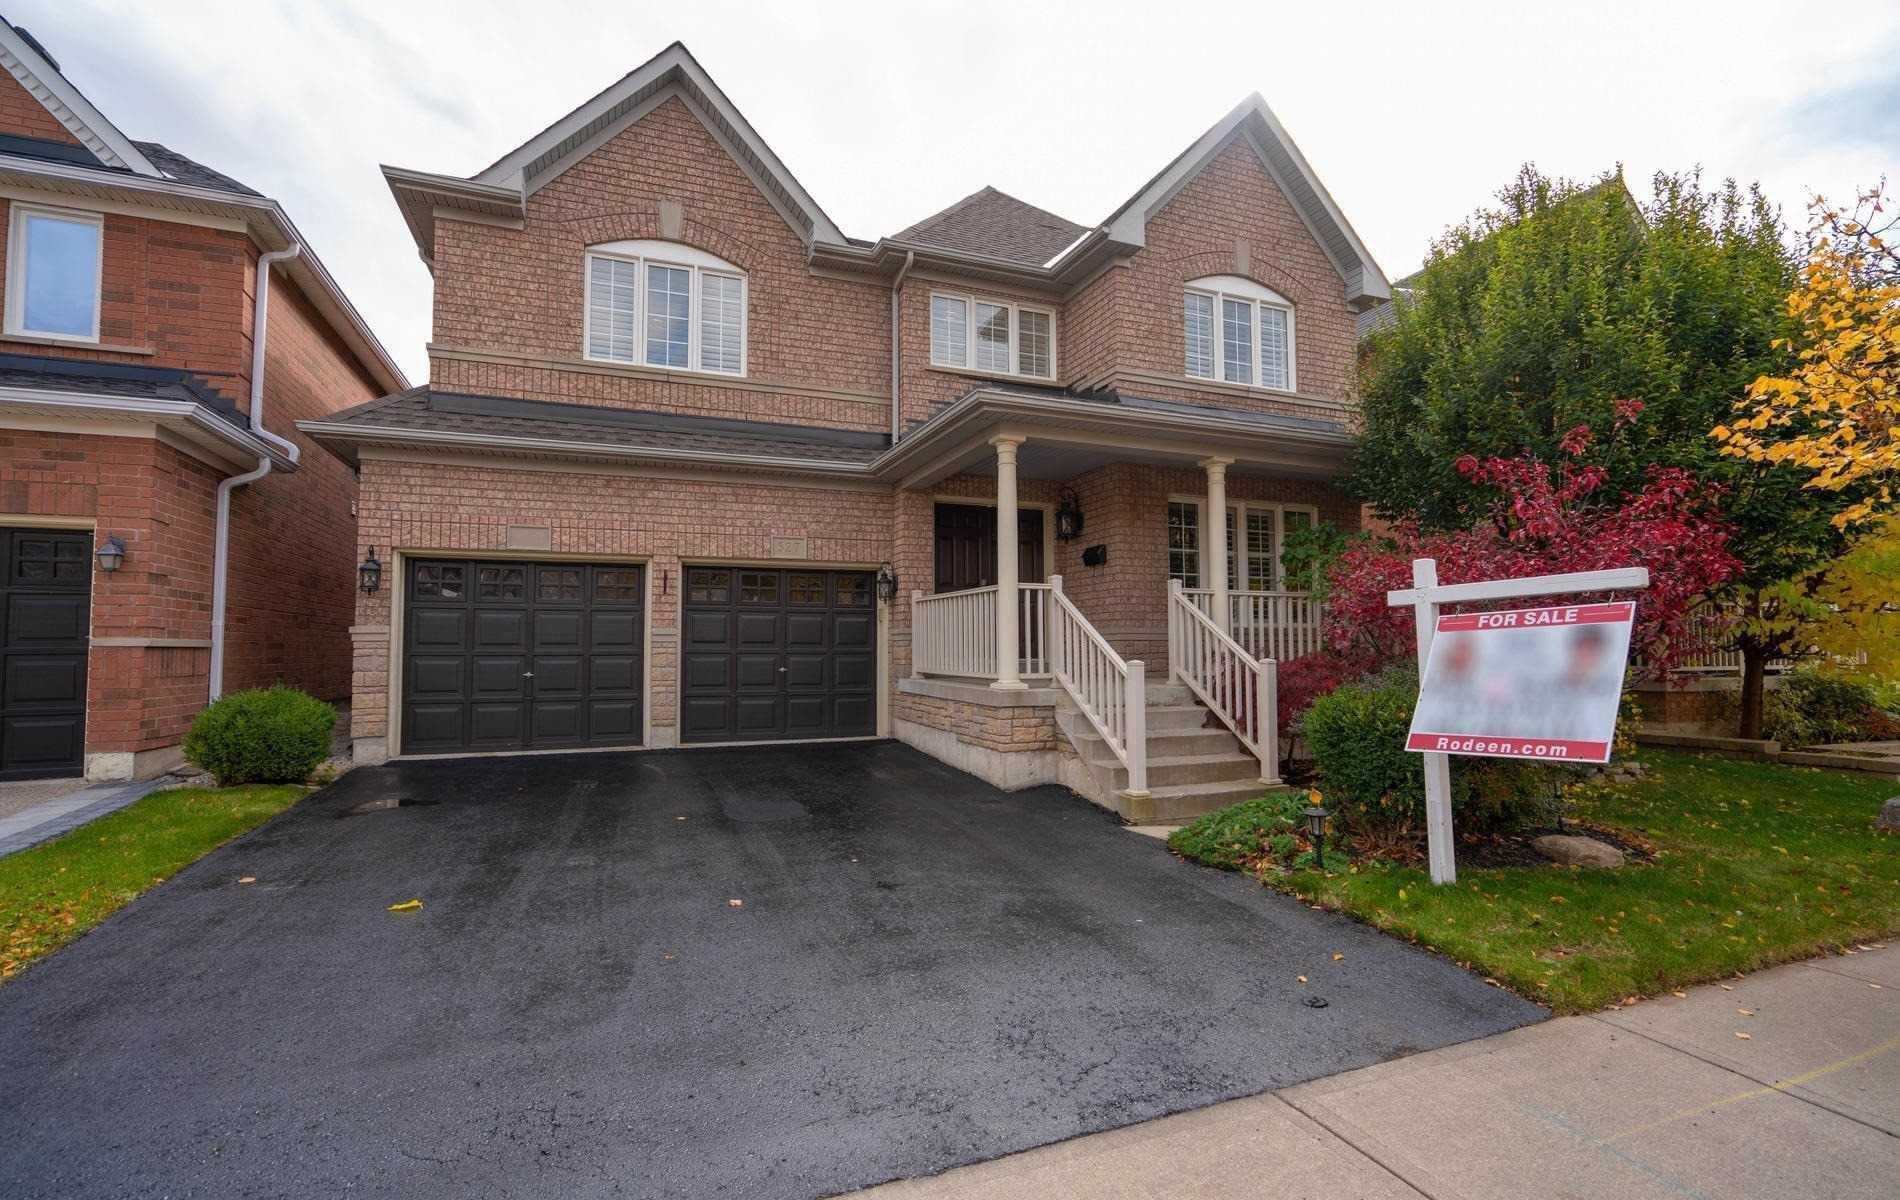 Main Photo: 527 Hartley Boulevard in Milton: Clarke House (2-Storey) for sale : MLS®# W4617262